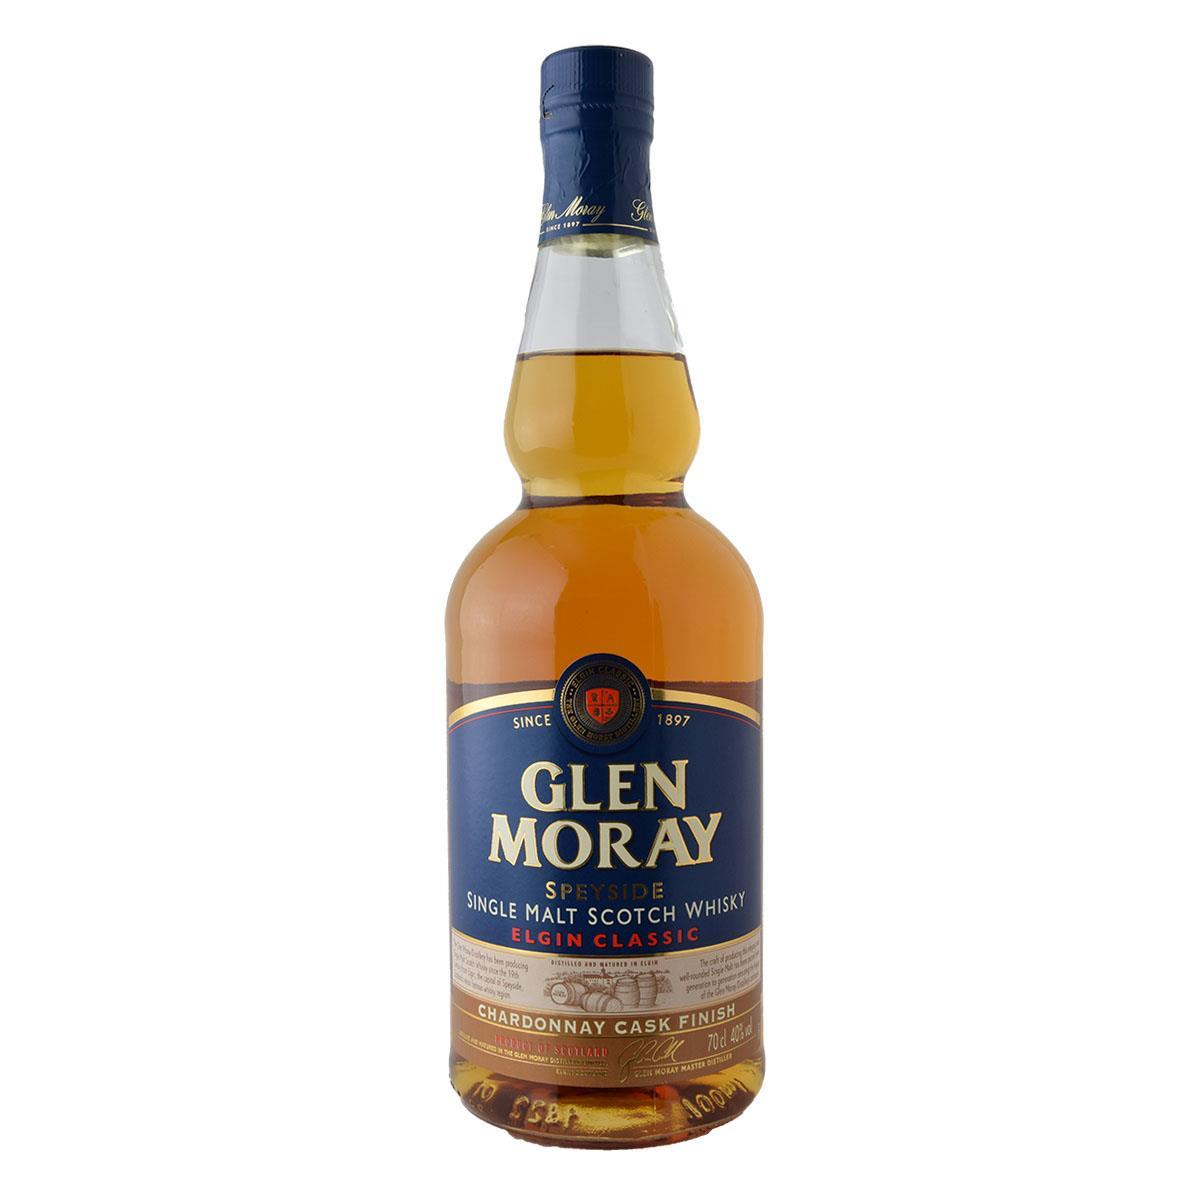 Glen Moray Chardonnay Cask Finish 700ml